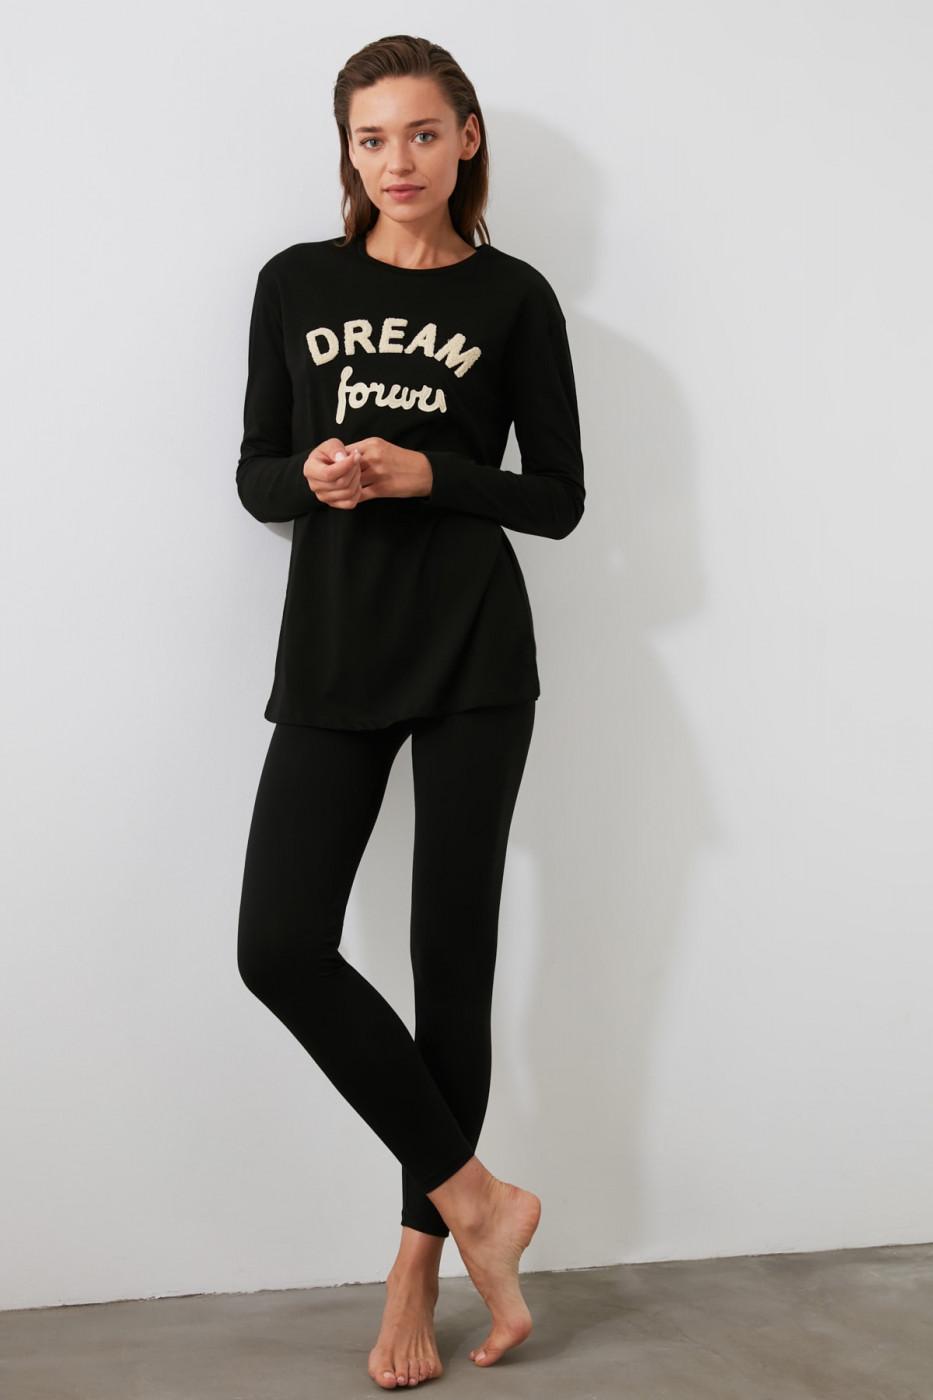 Trendyol Knitted Pyjamas Kit with Black Slogan